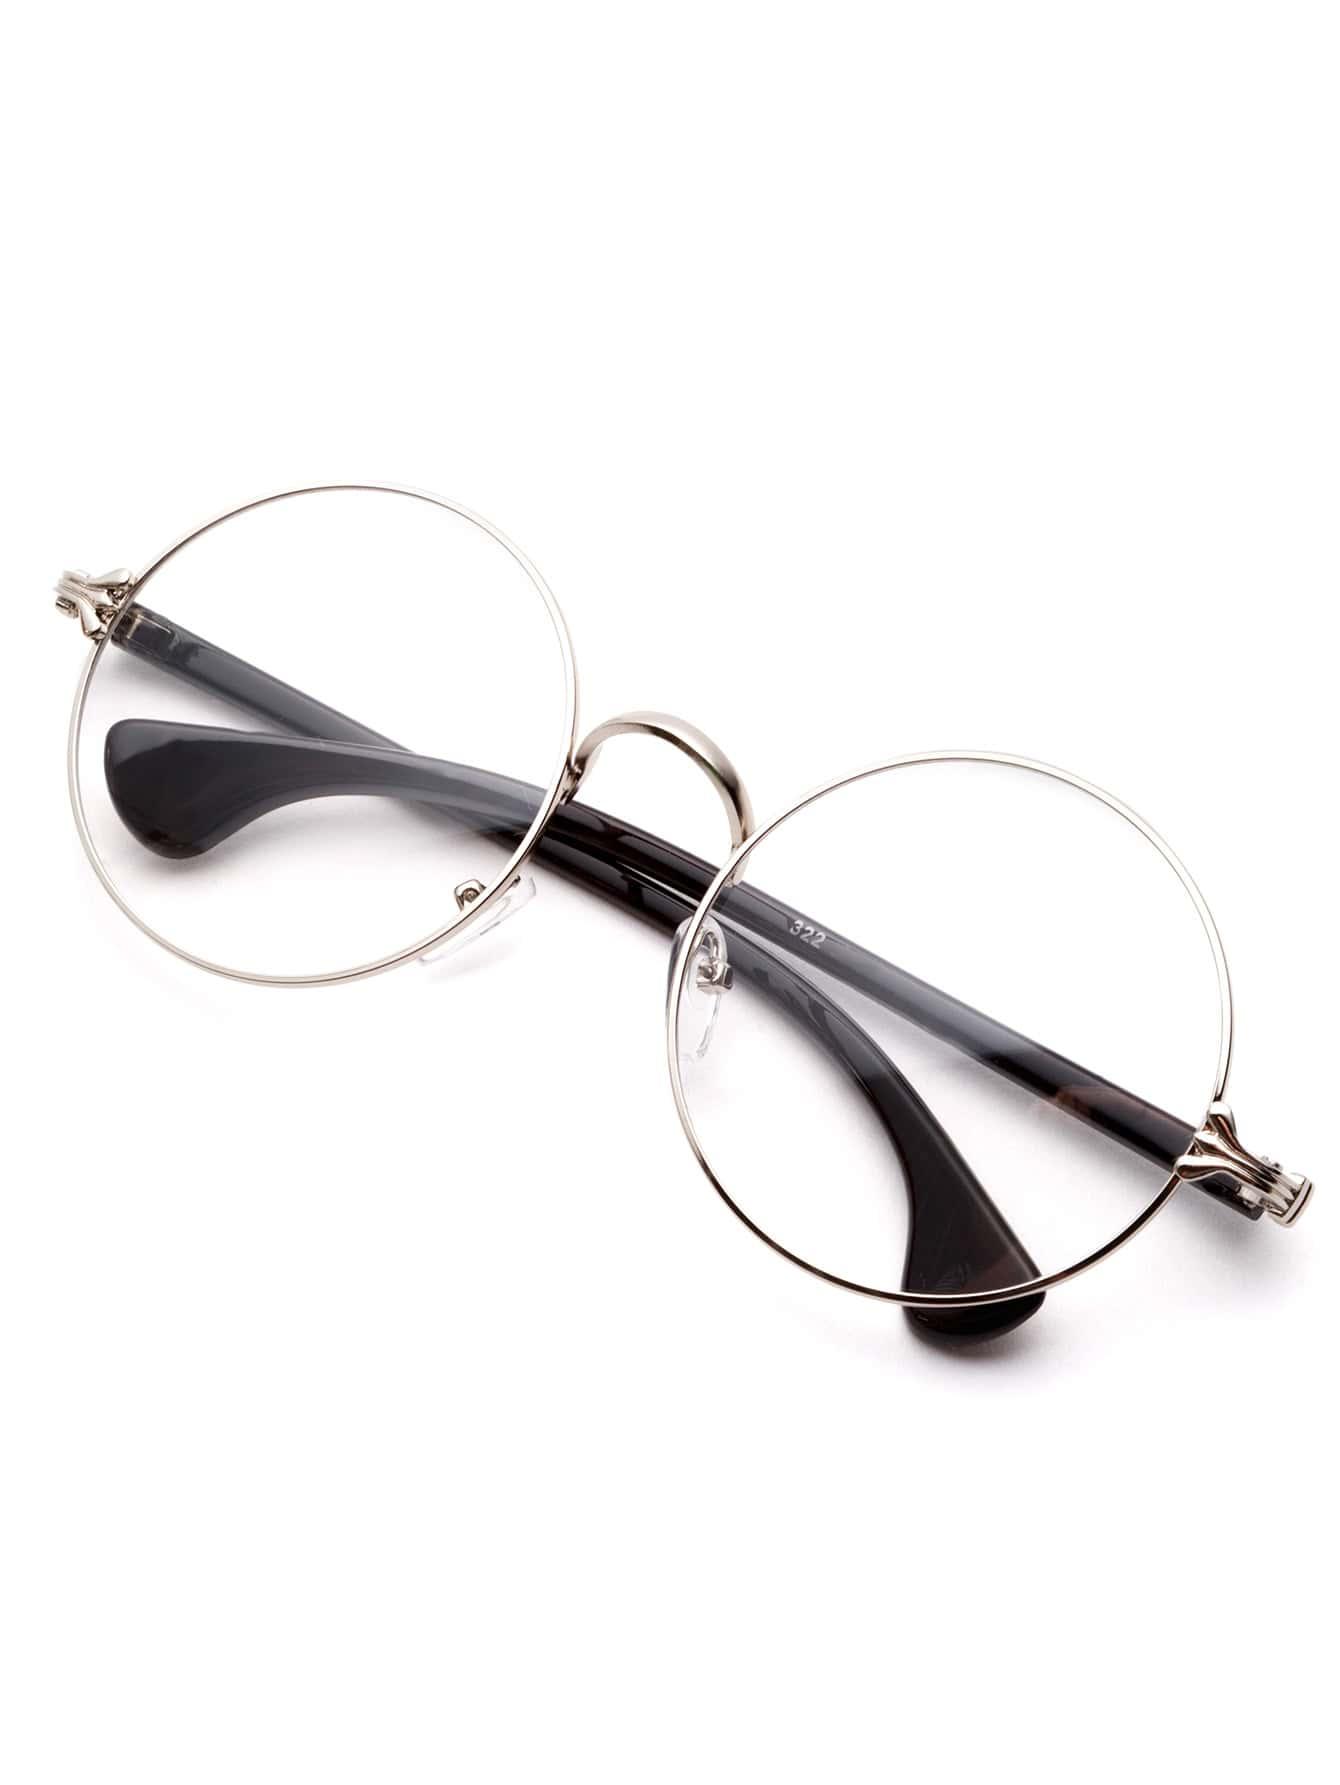 Silver Frame Black Arm Clear Lens Glasses